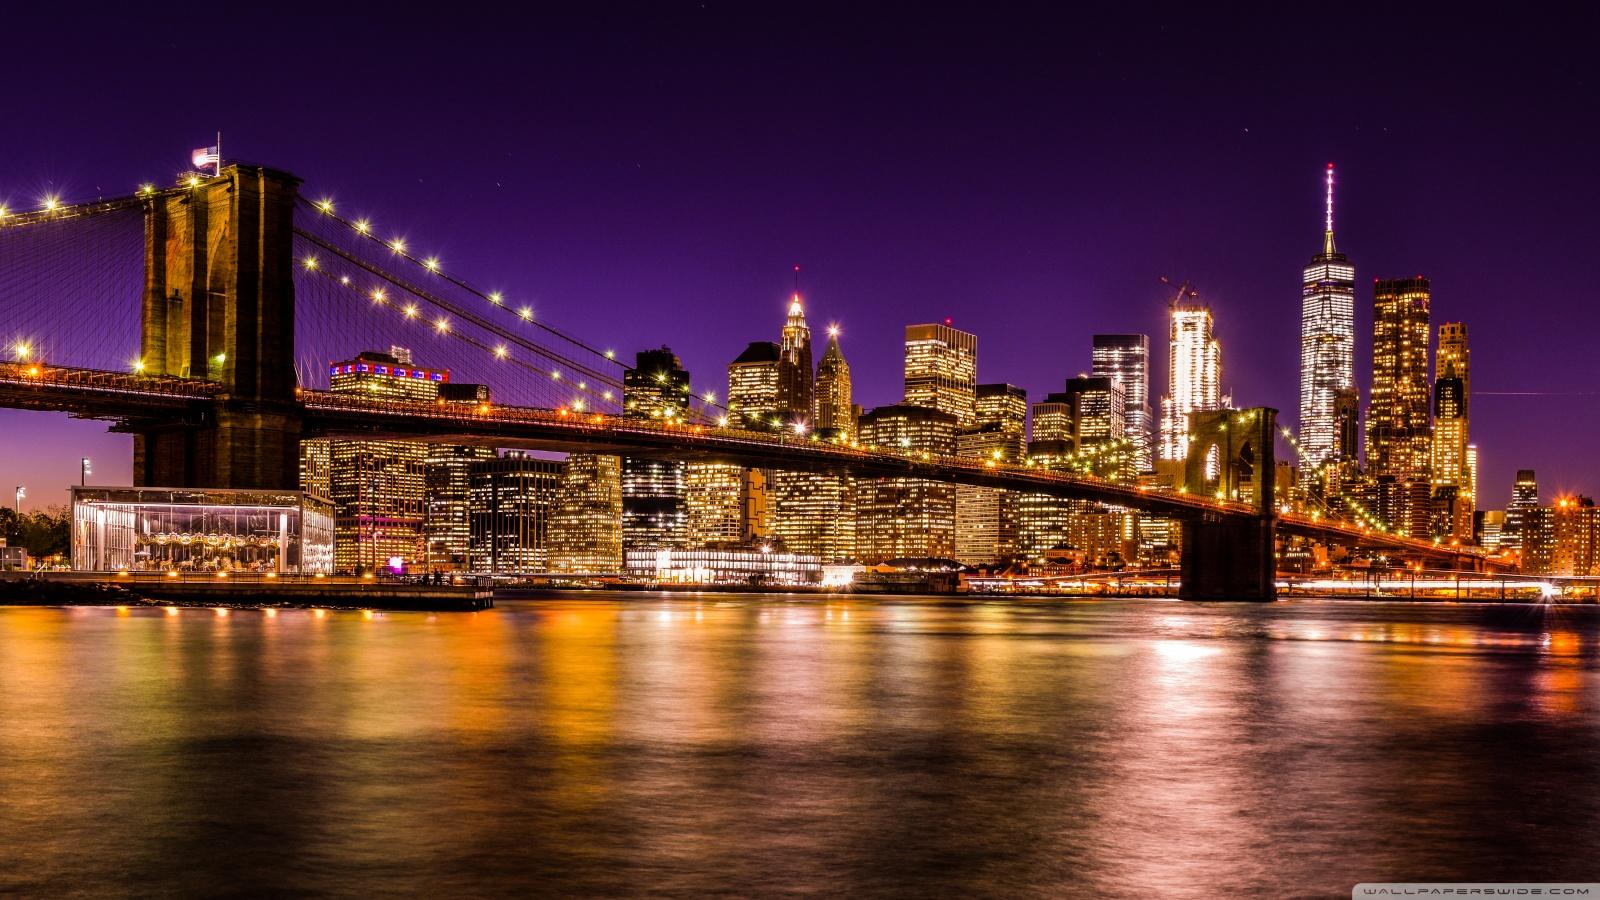 beautiful things images brooklyn bridge at night 2 wallpaper